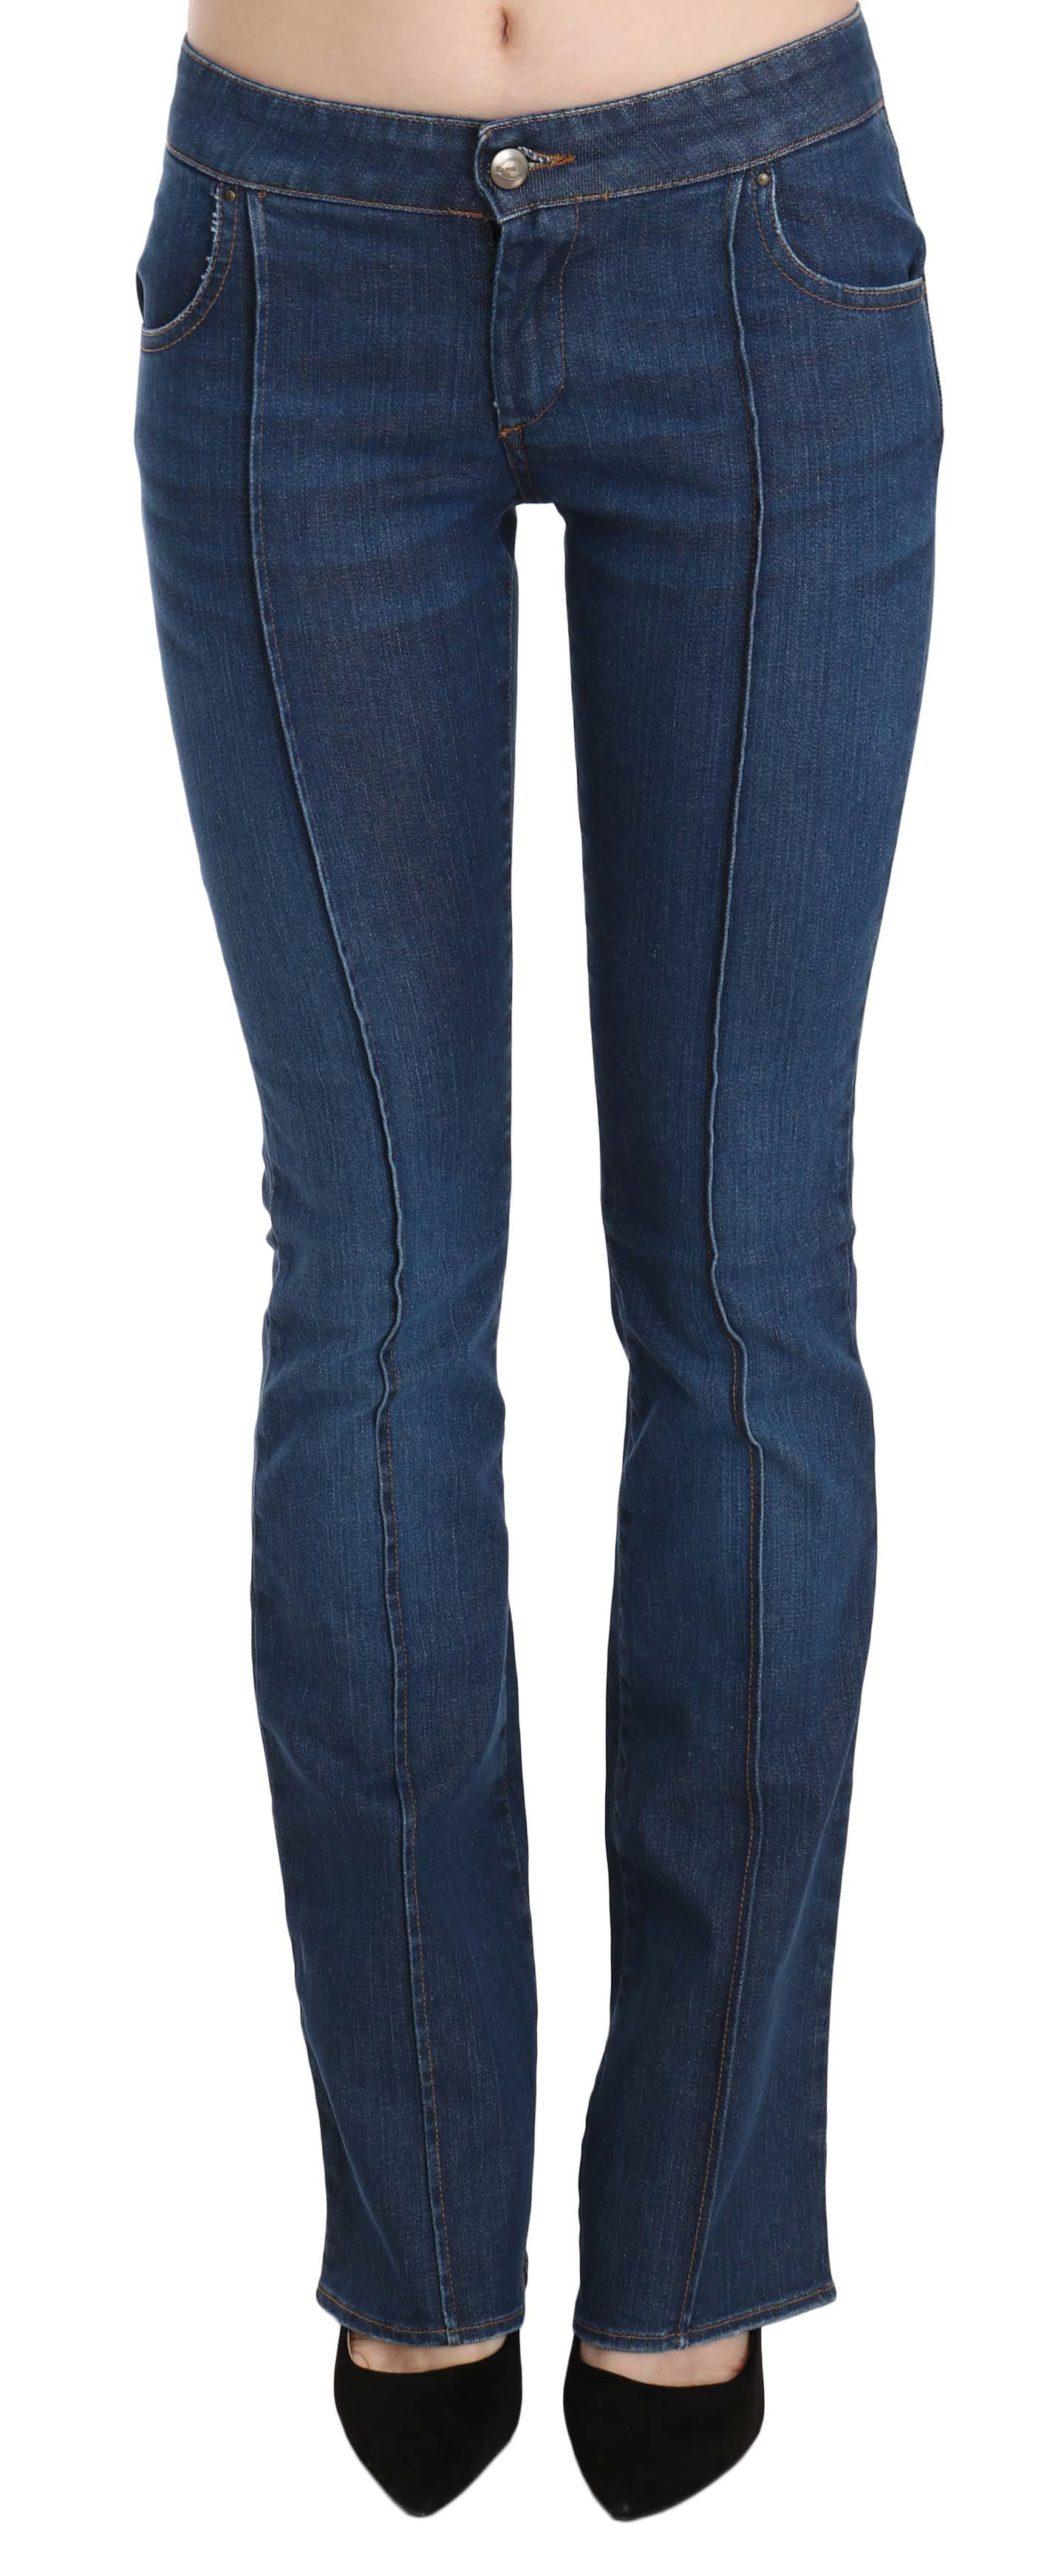 Just Cavalli Women's Low Waist Boot Cut Denim Trouser Blue PAN70363 - IT40